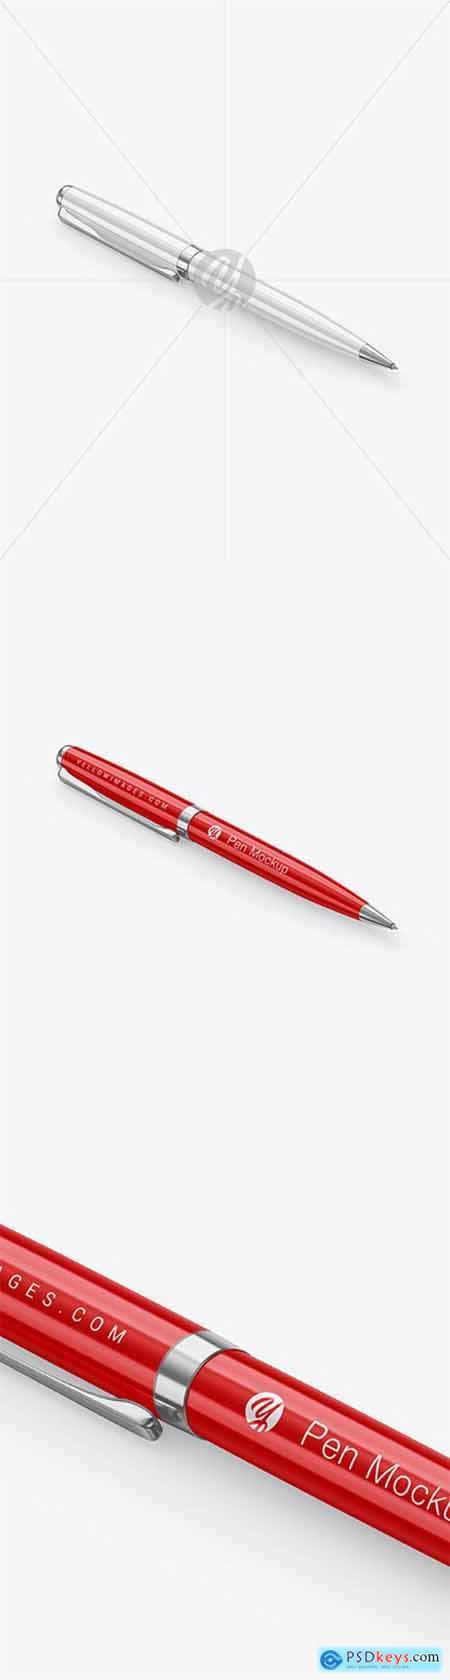 Glossy Pen w- Metallic Finish Mockup 65922